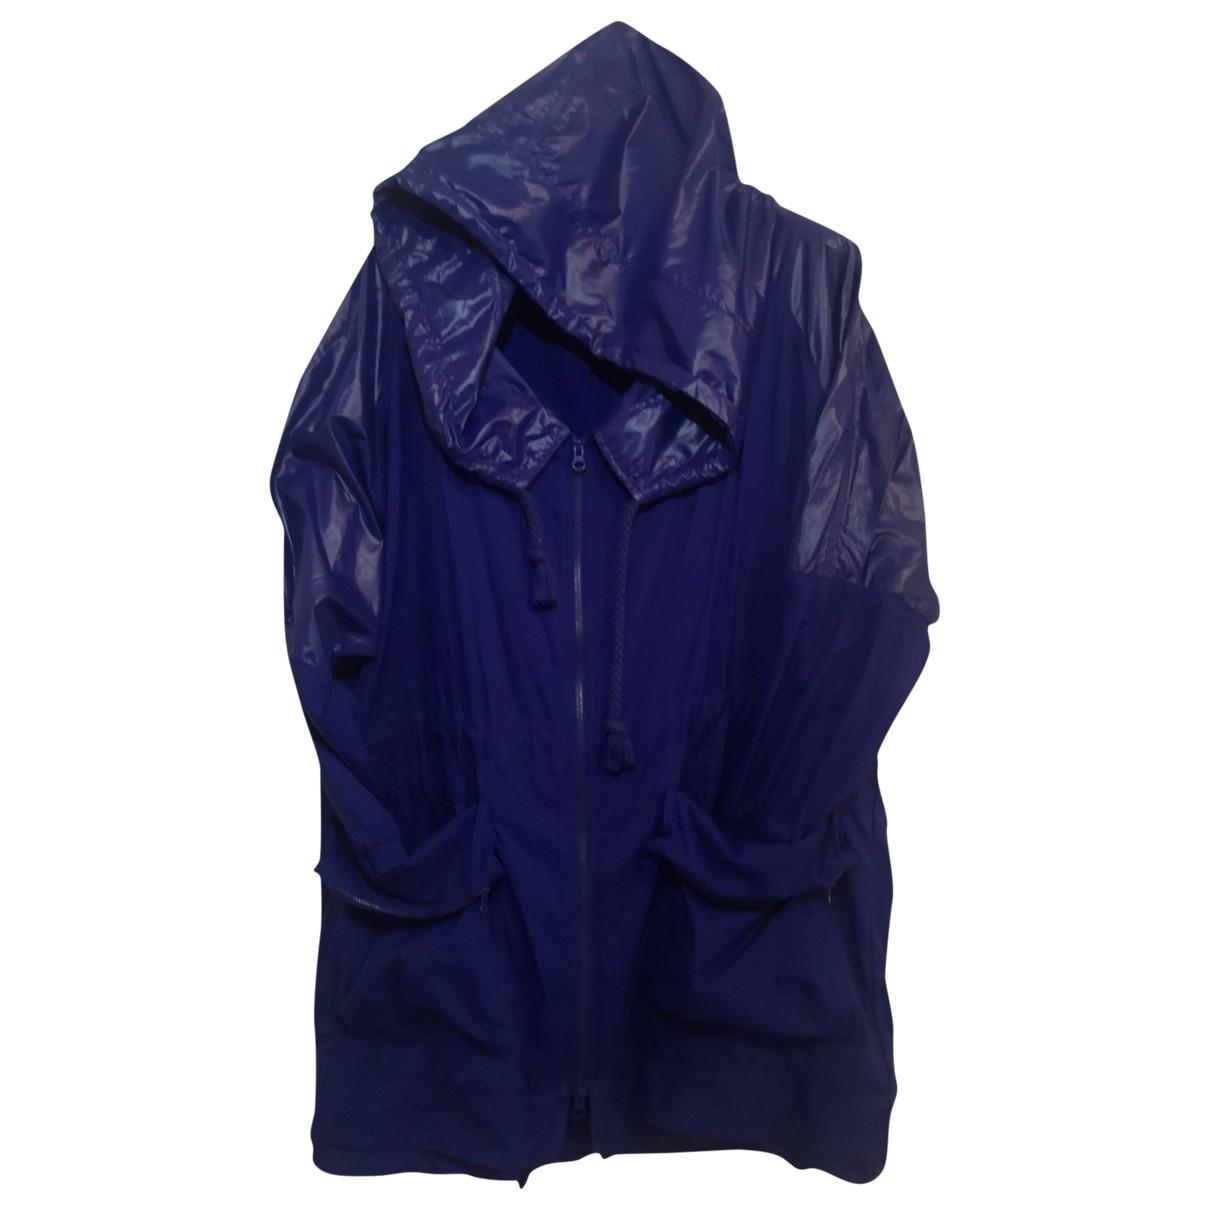 Stella Mccartney Pour Adidas \N Blue jacket for Women S International